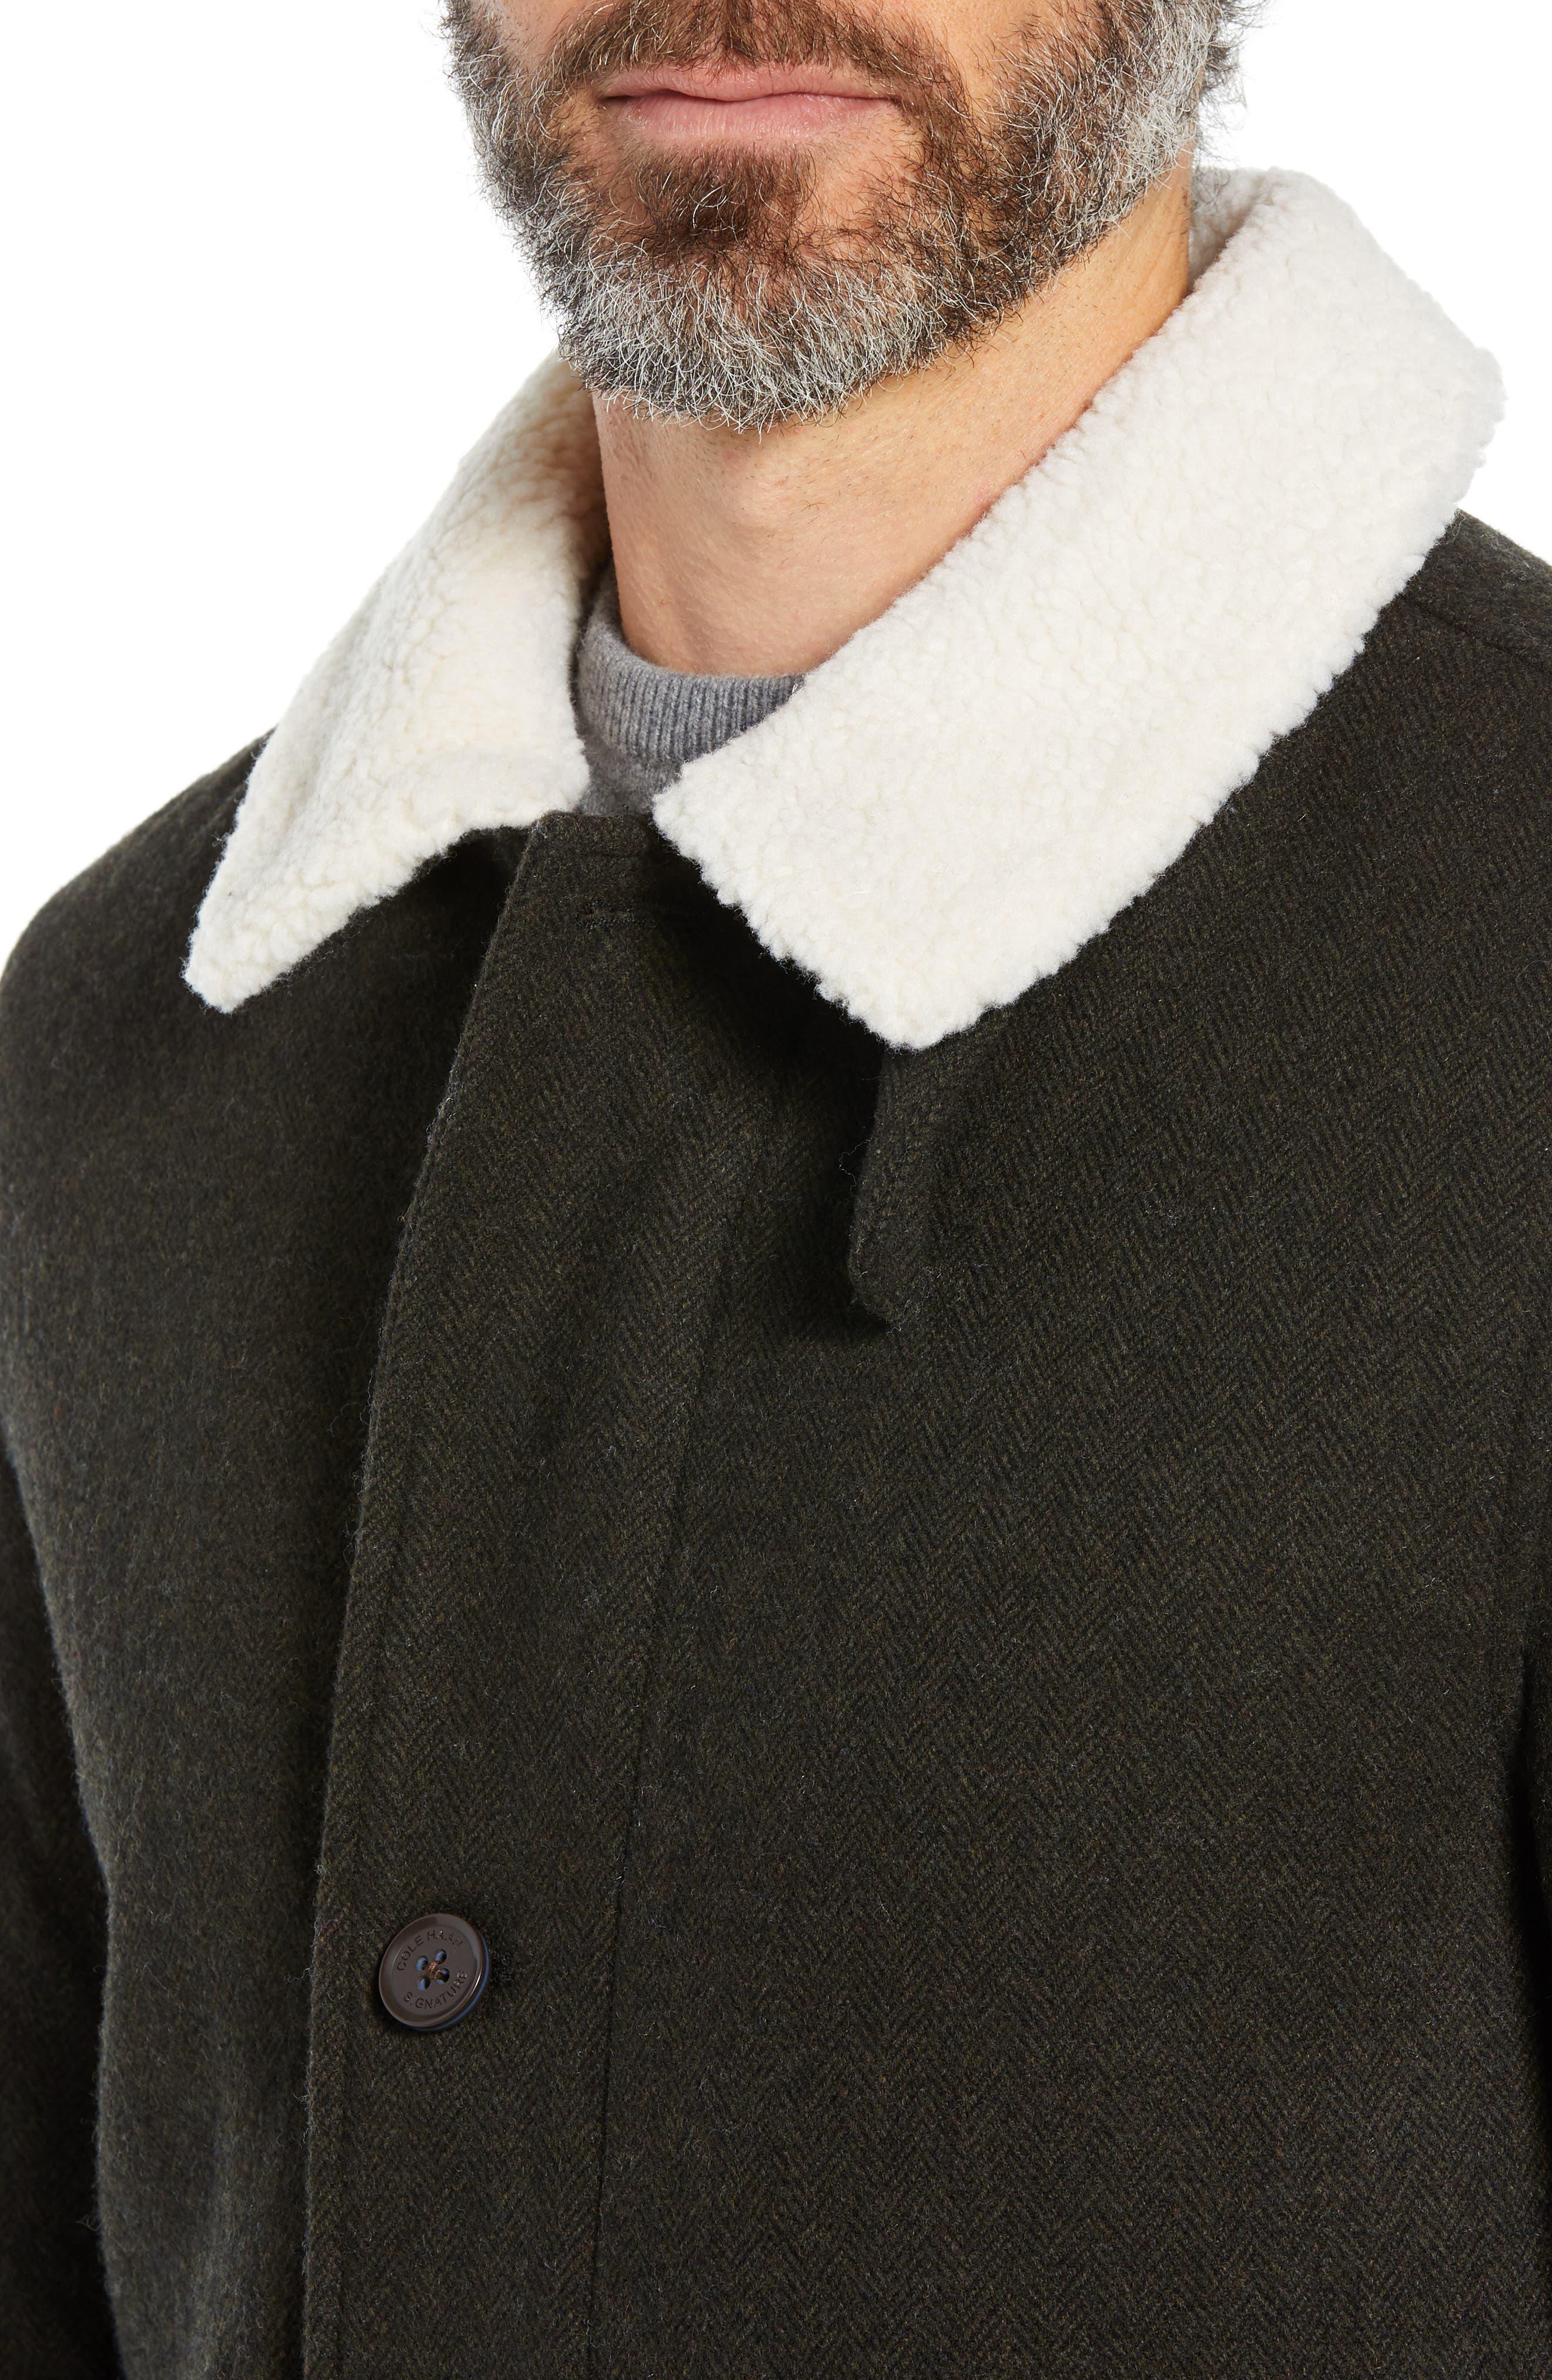 COLE HAAN SIGNATURE,                             Faux Shearling Trim Field Jacket,                             Alternate thumbnail 4, color,                             317